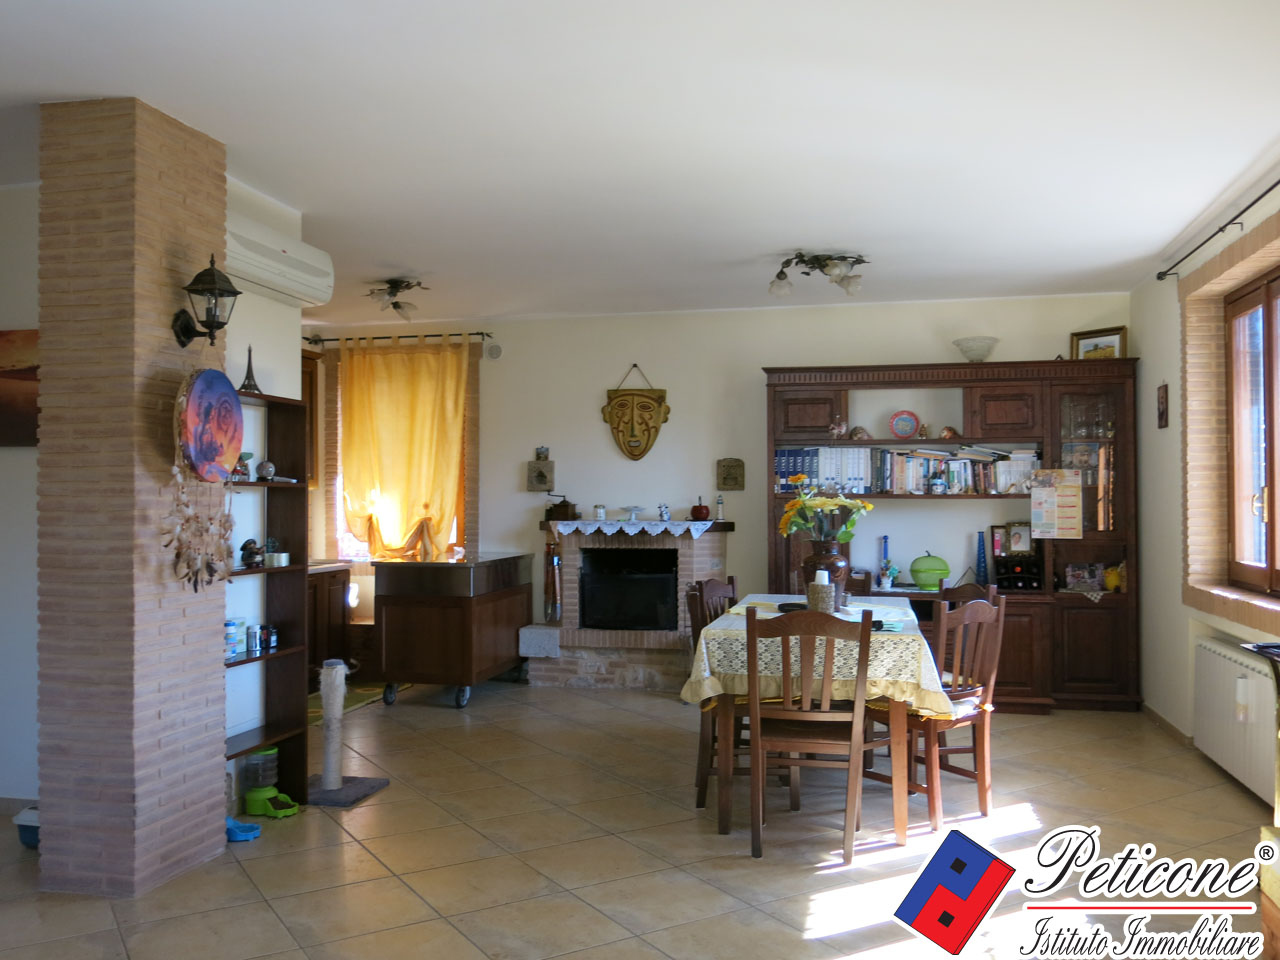 Villa in Vendita a Fondi: 3 locali, 107 mq - Foto 6